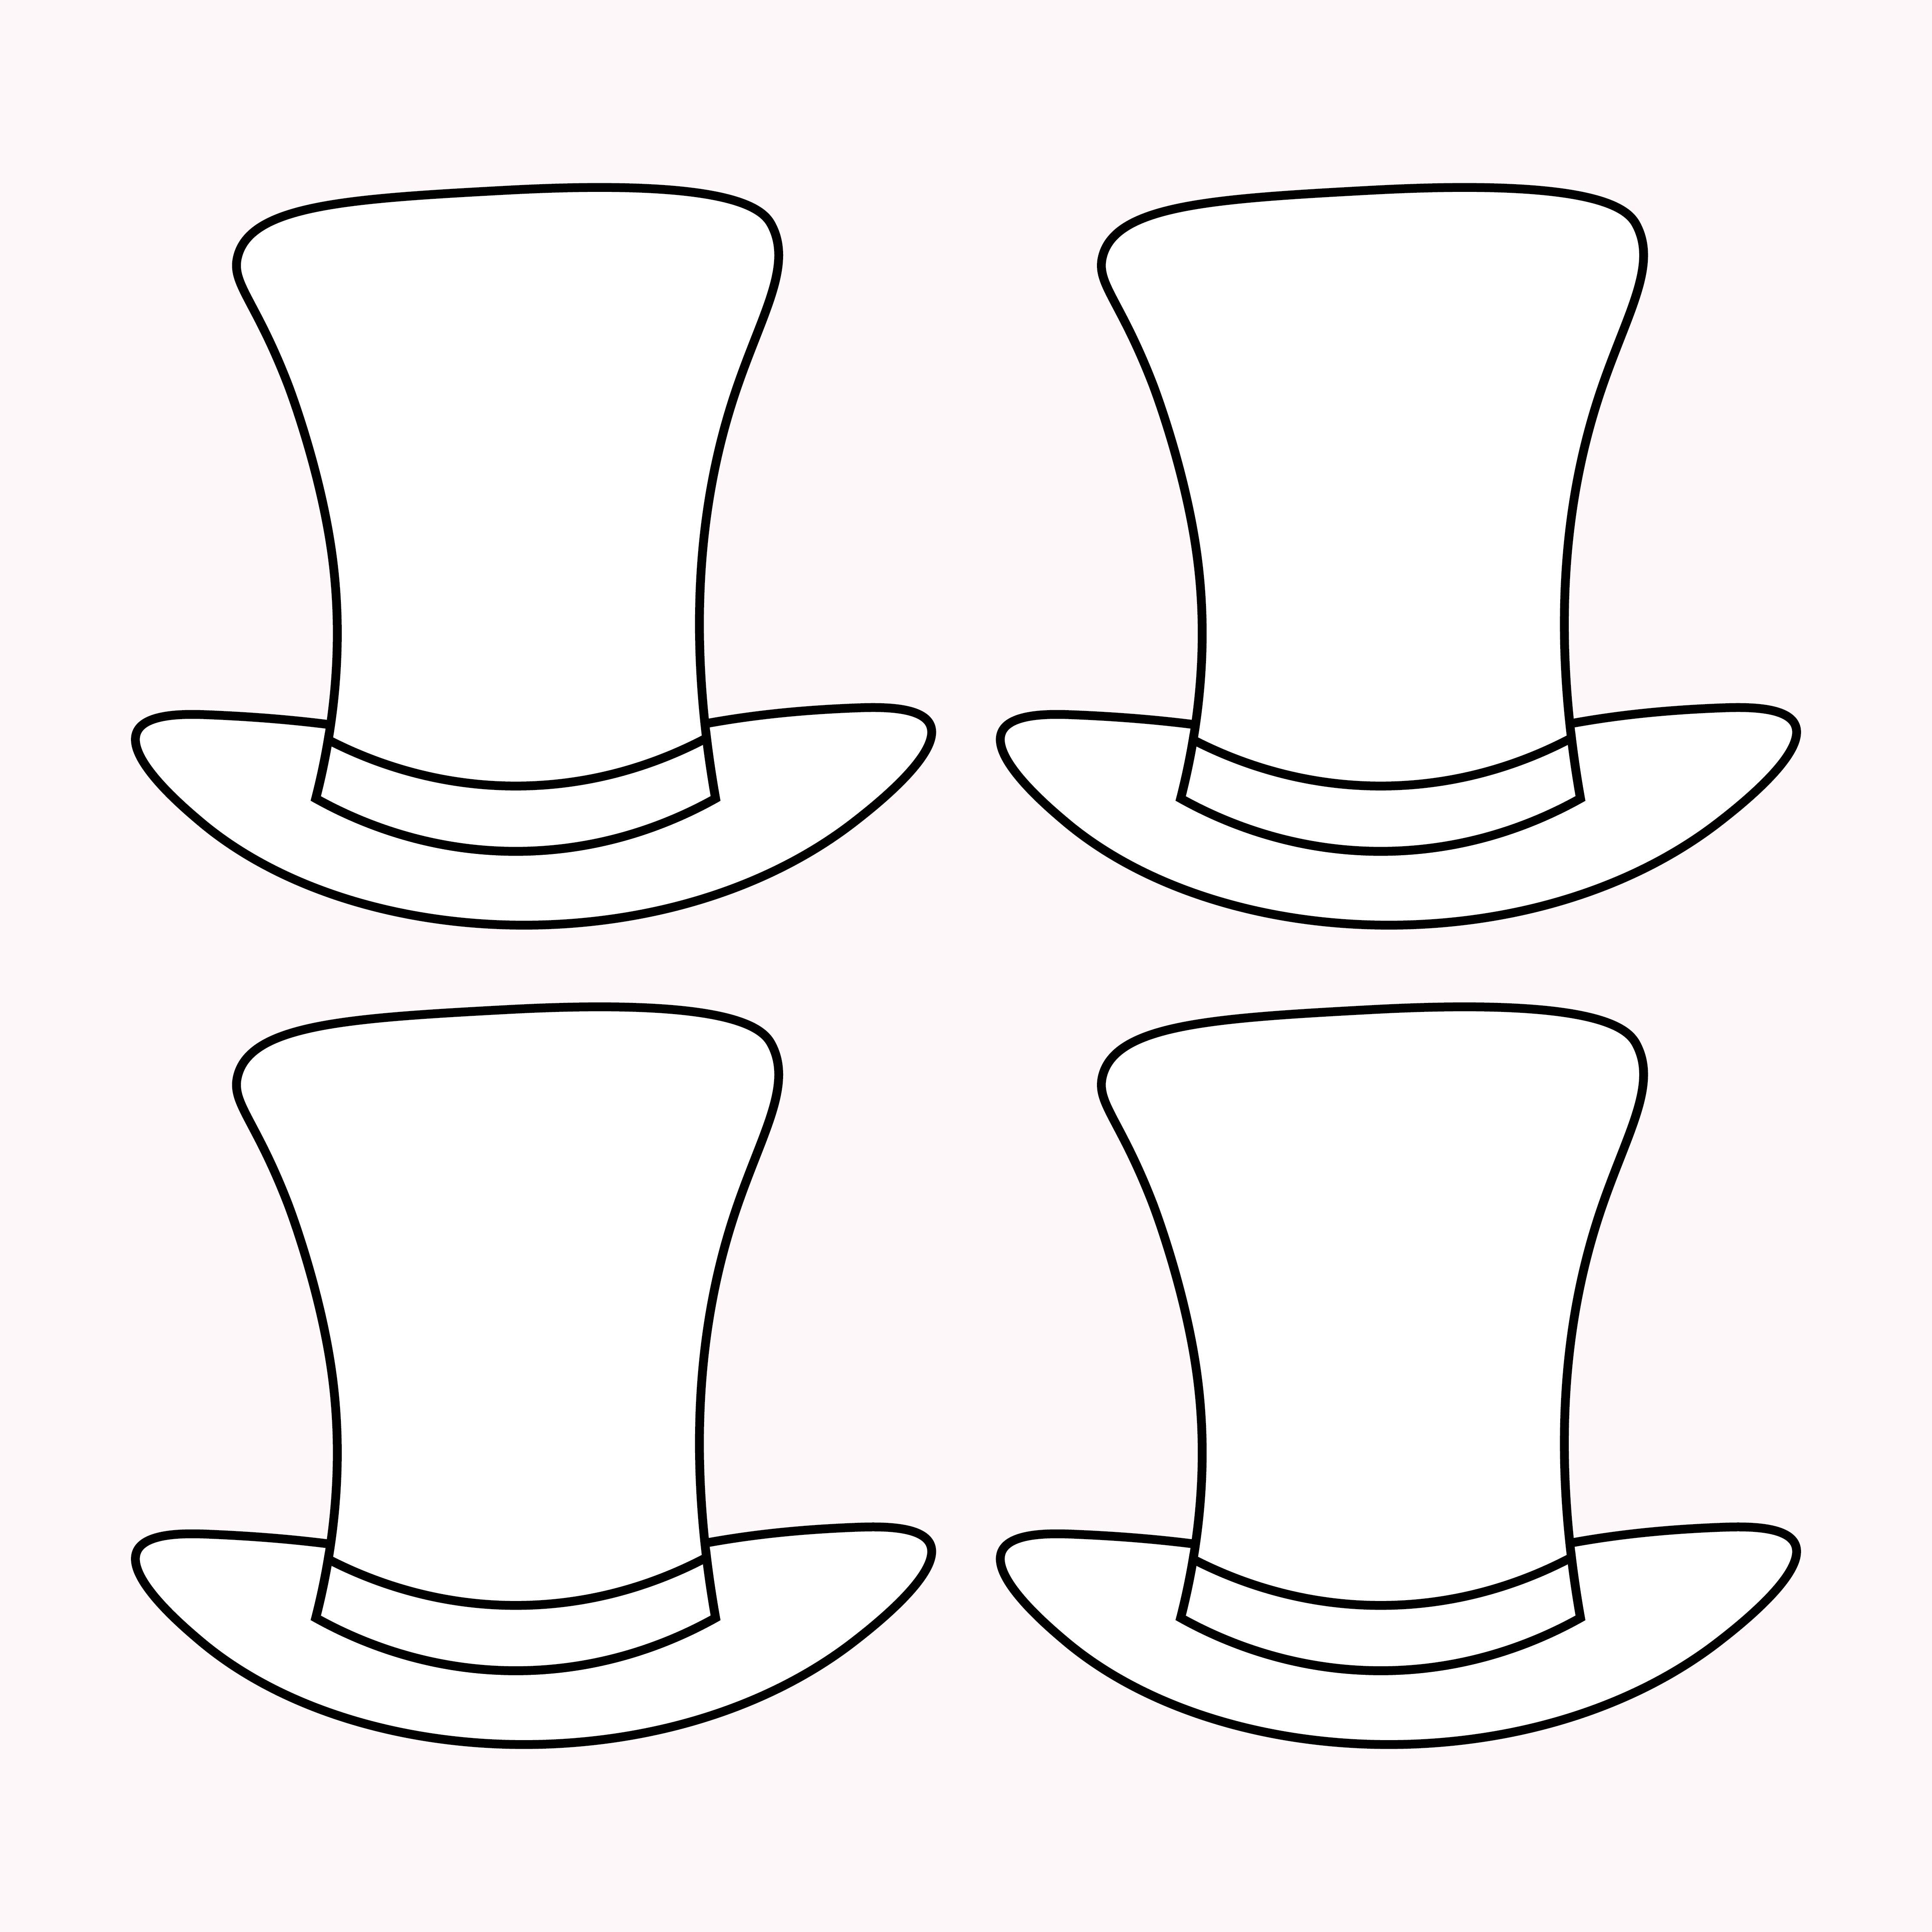 Top Hat Template Printable Free